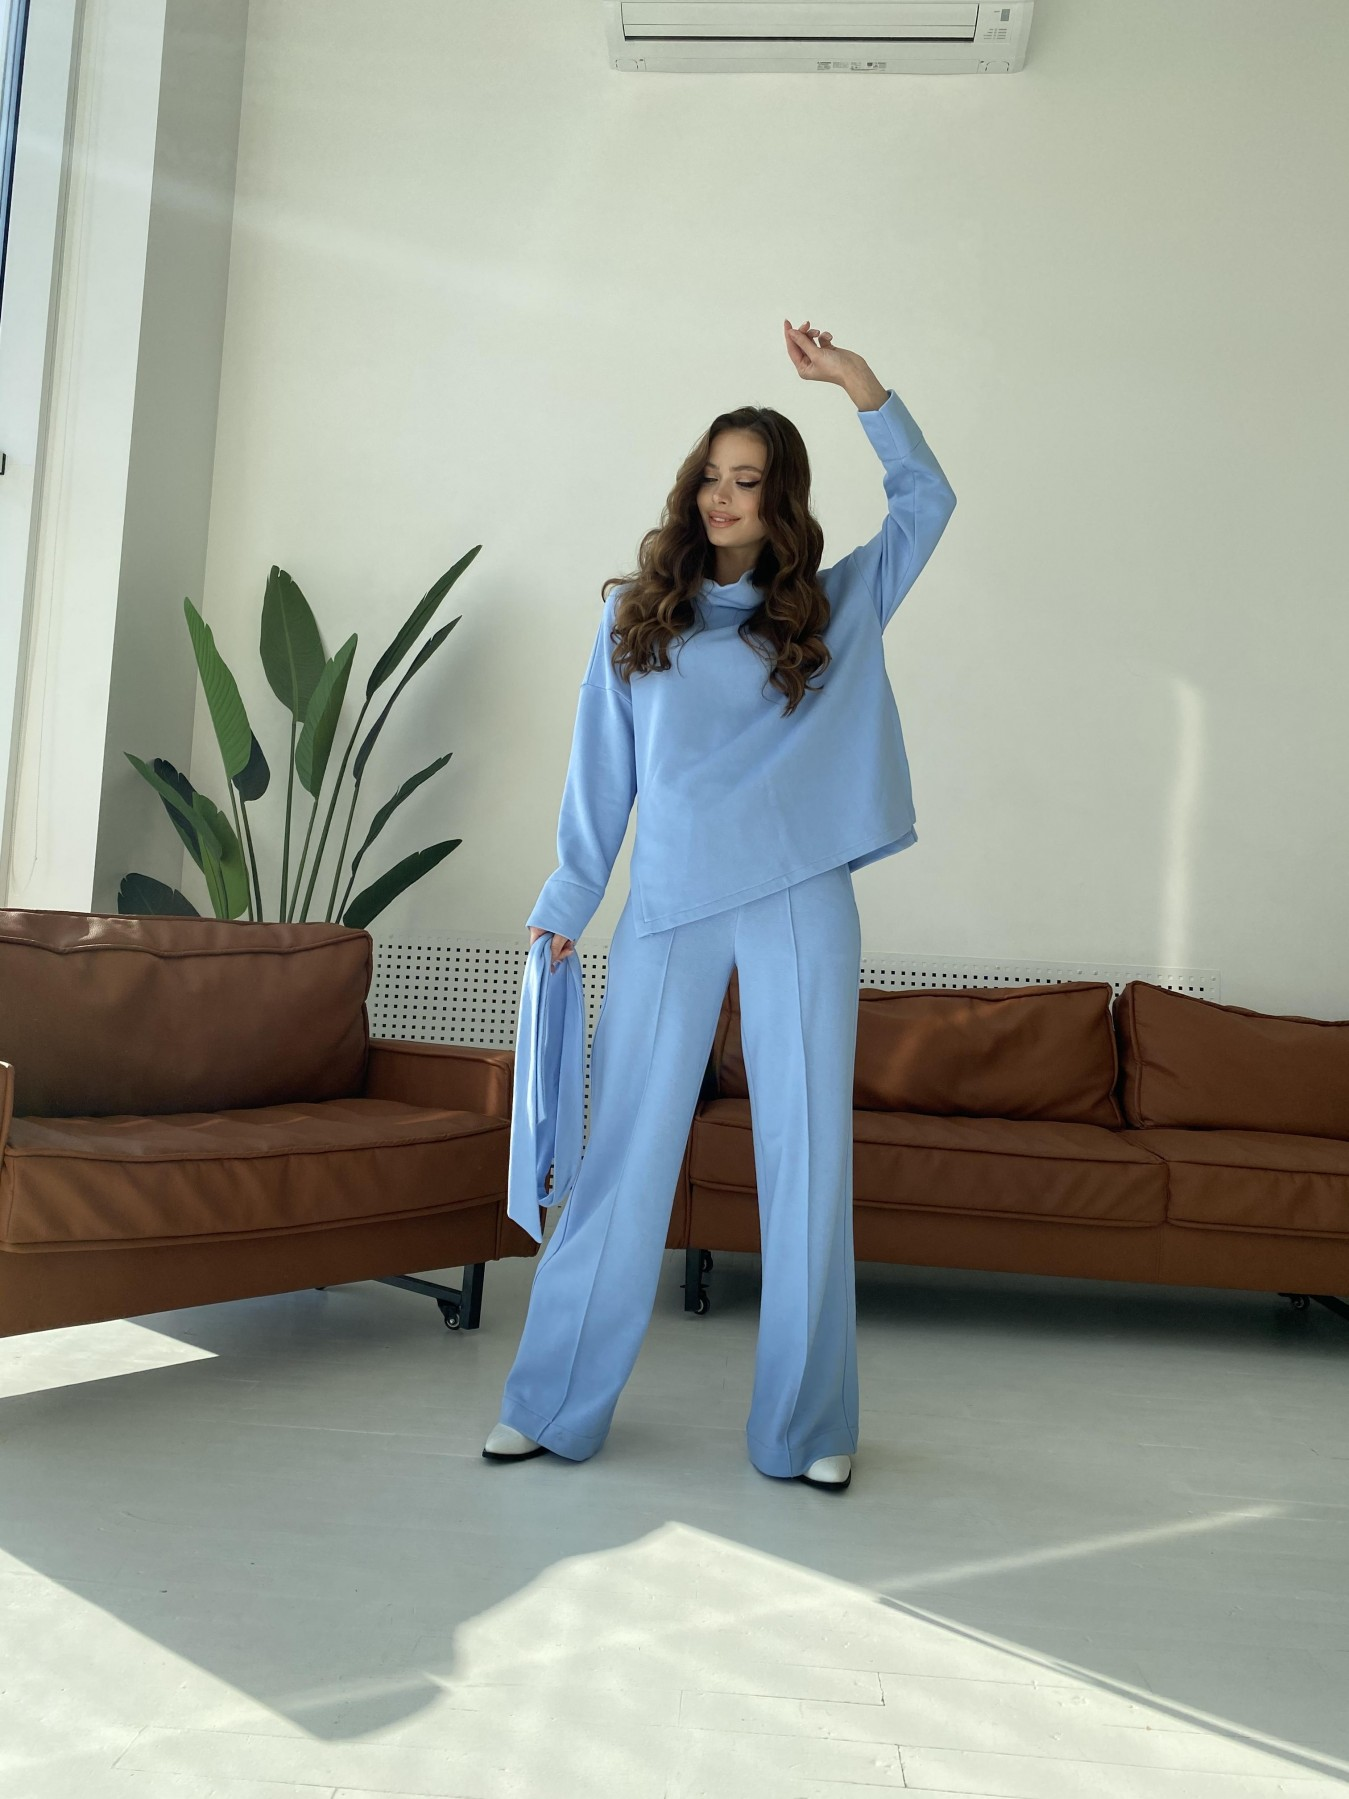 Джаст костюм Oversize  3х нитка 10564 АРТ. 47245 Цвет: Голубой - фото 4, интернет магазин tm-modus.ru